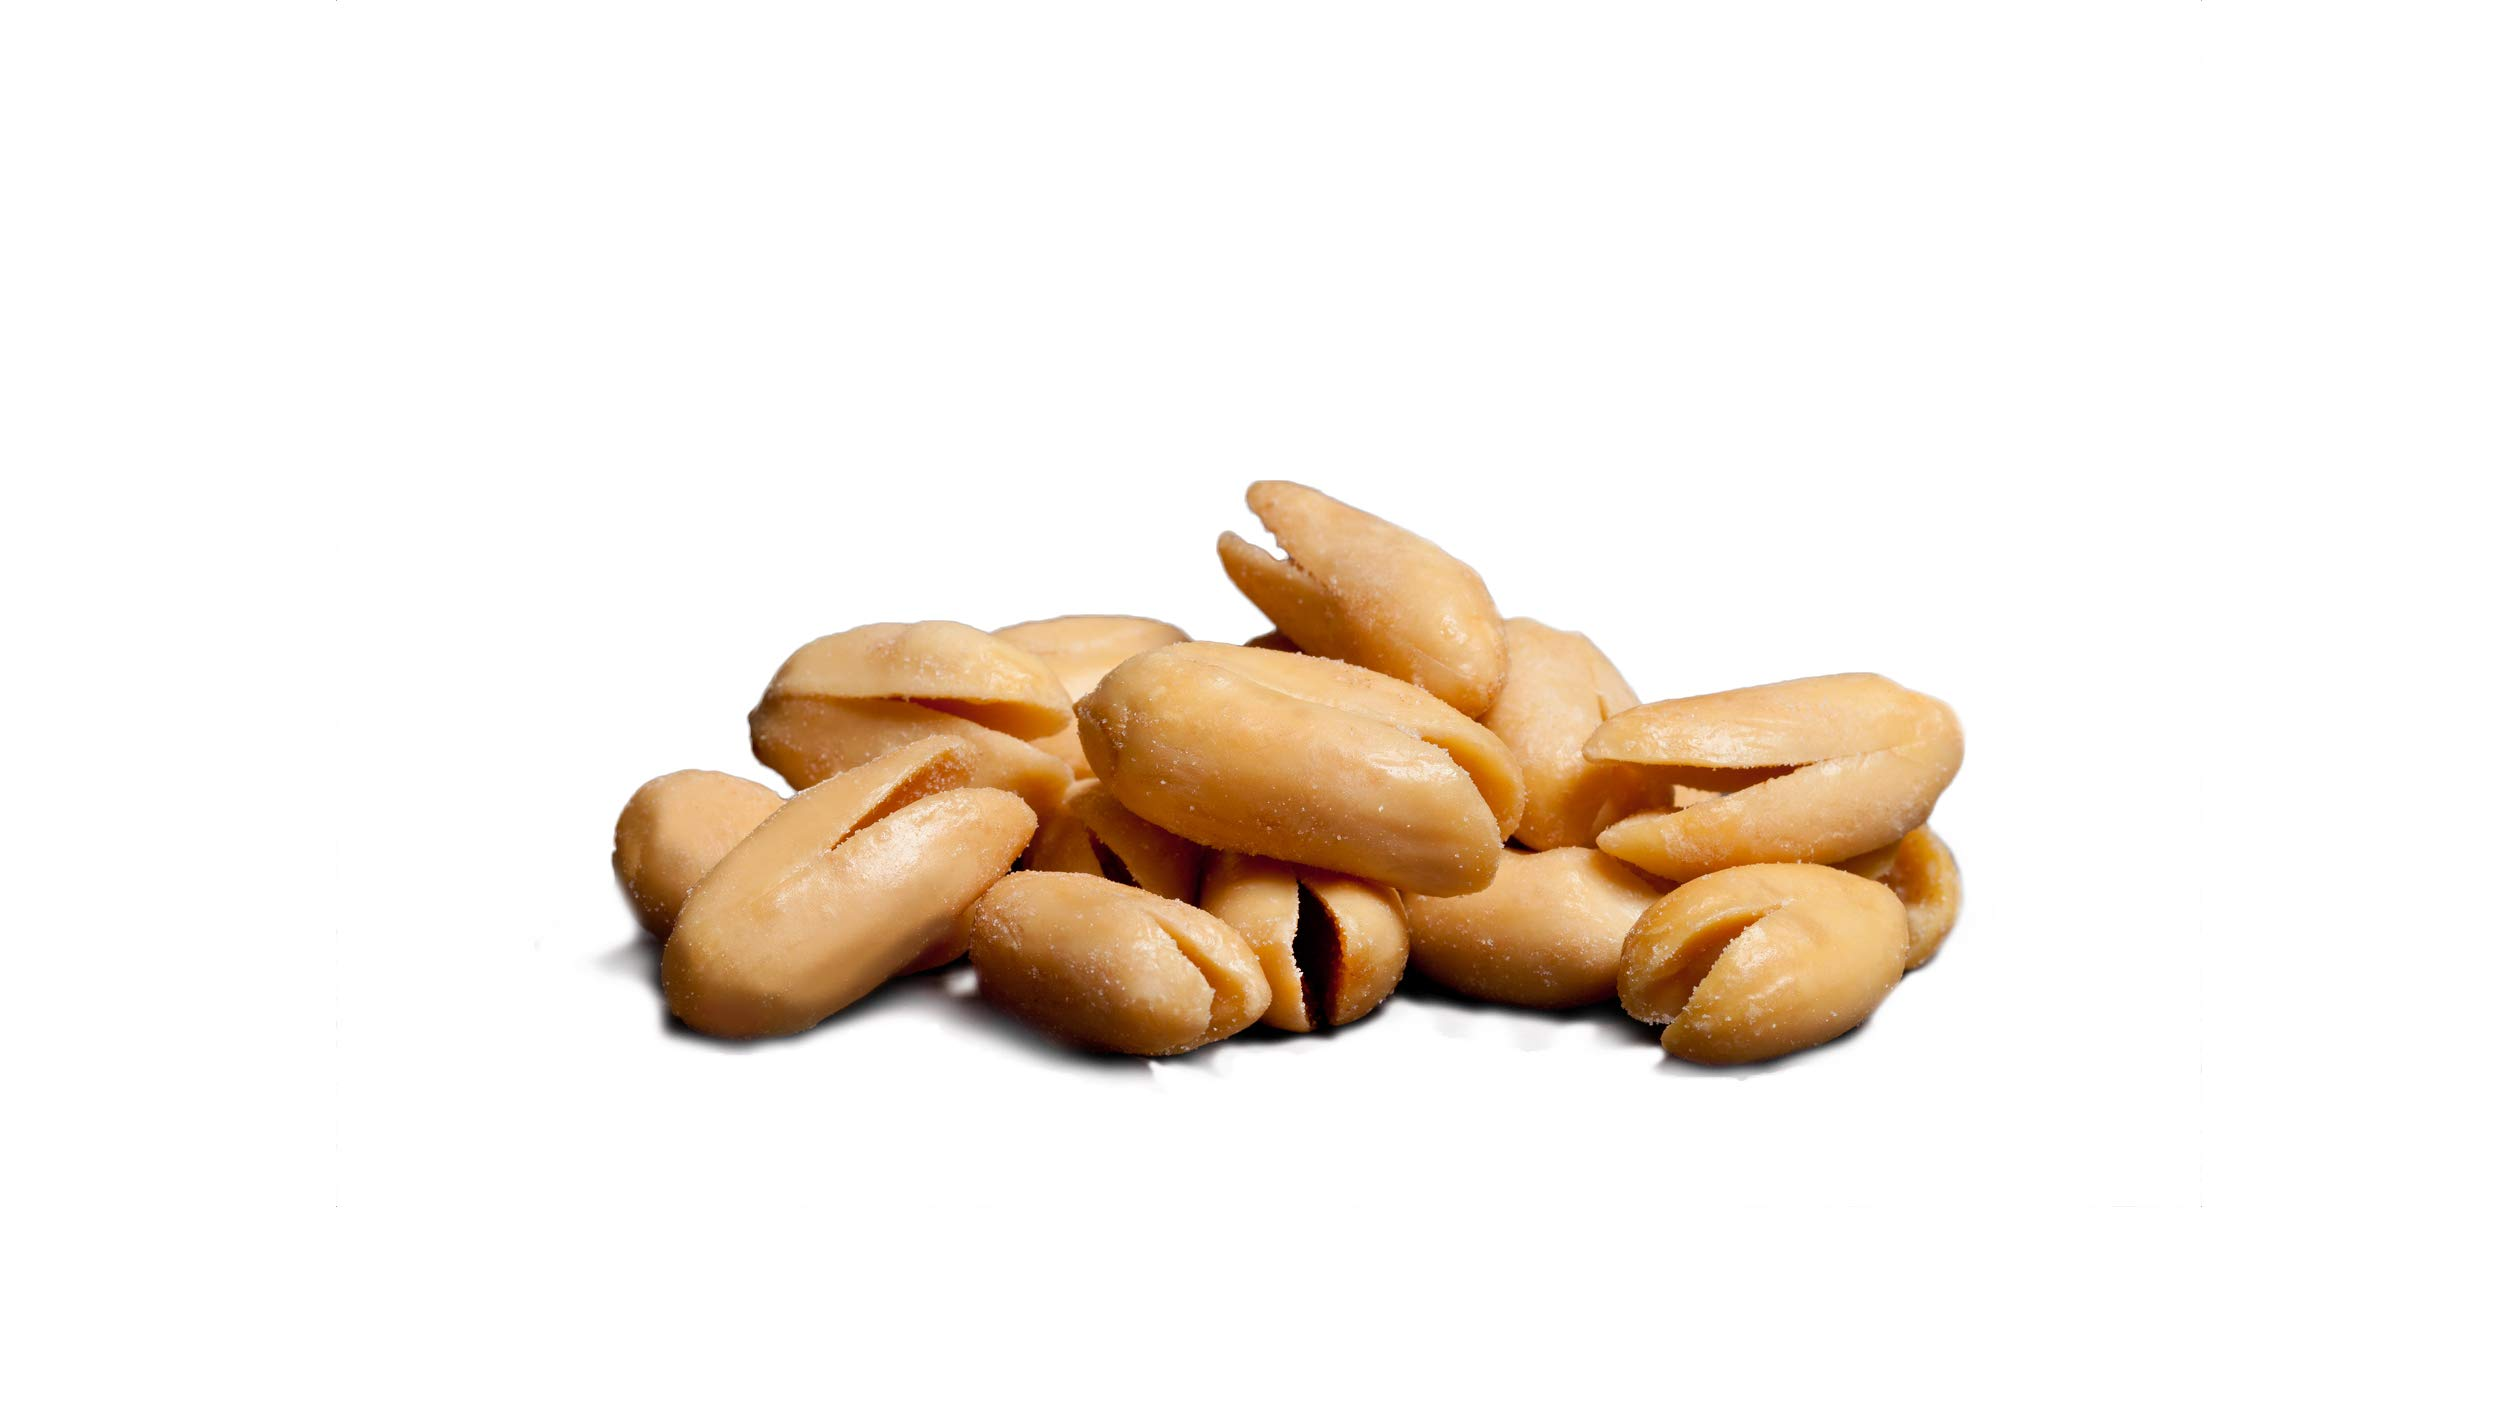 Royal Oak Gourmet Virginia Salted Peanuts, 40-Ounce Tins (Pack of 2)